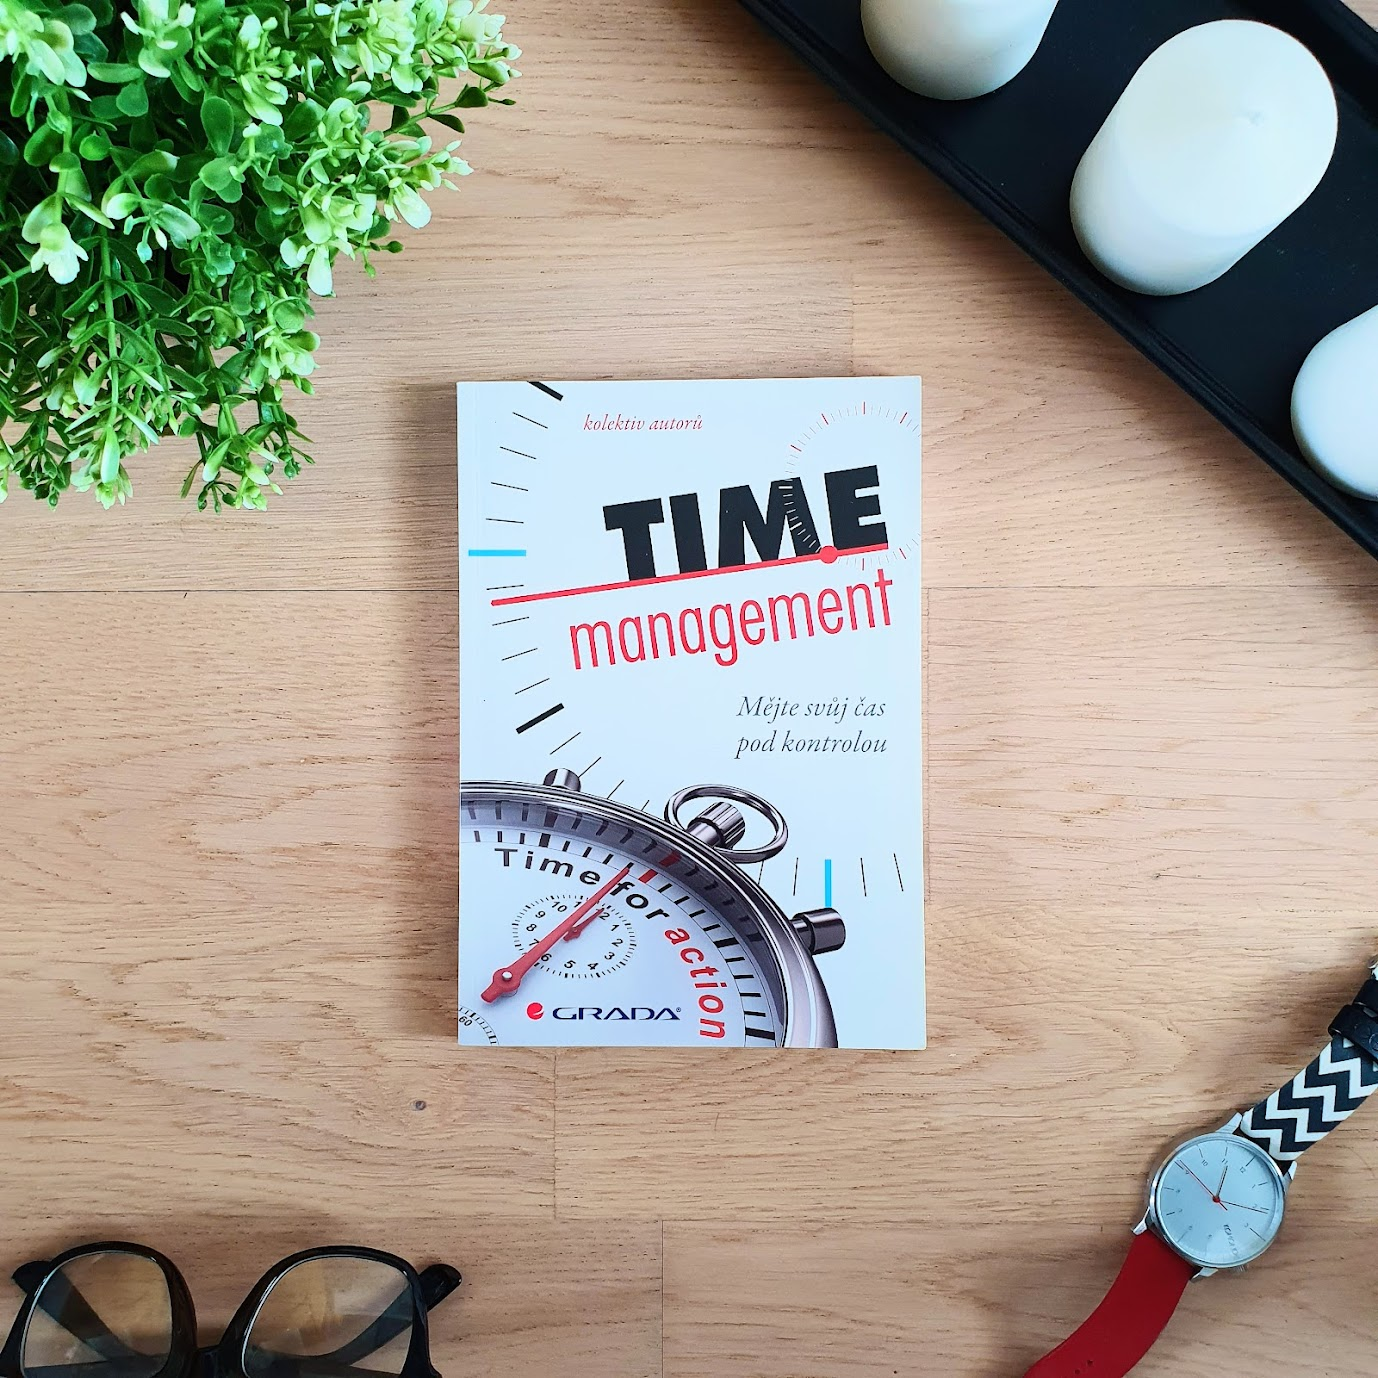 Time management (Zeitmanagement) - Jörg Knoblauch, Holger Wöltje, Marcus B. Hausner, Martin Kimmich, Siegfried Lachmann